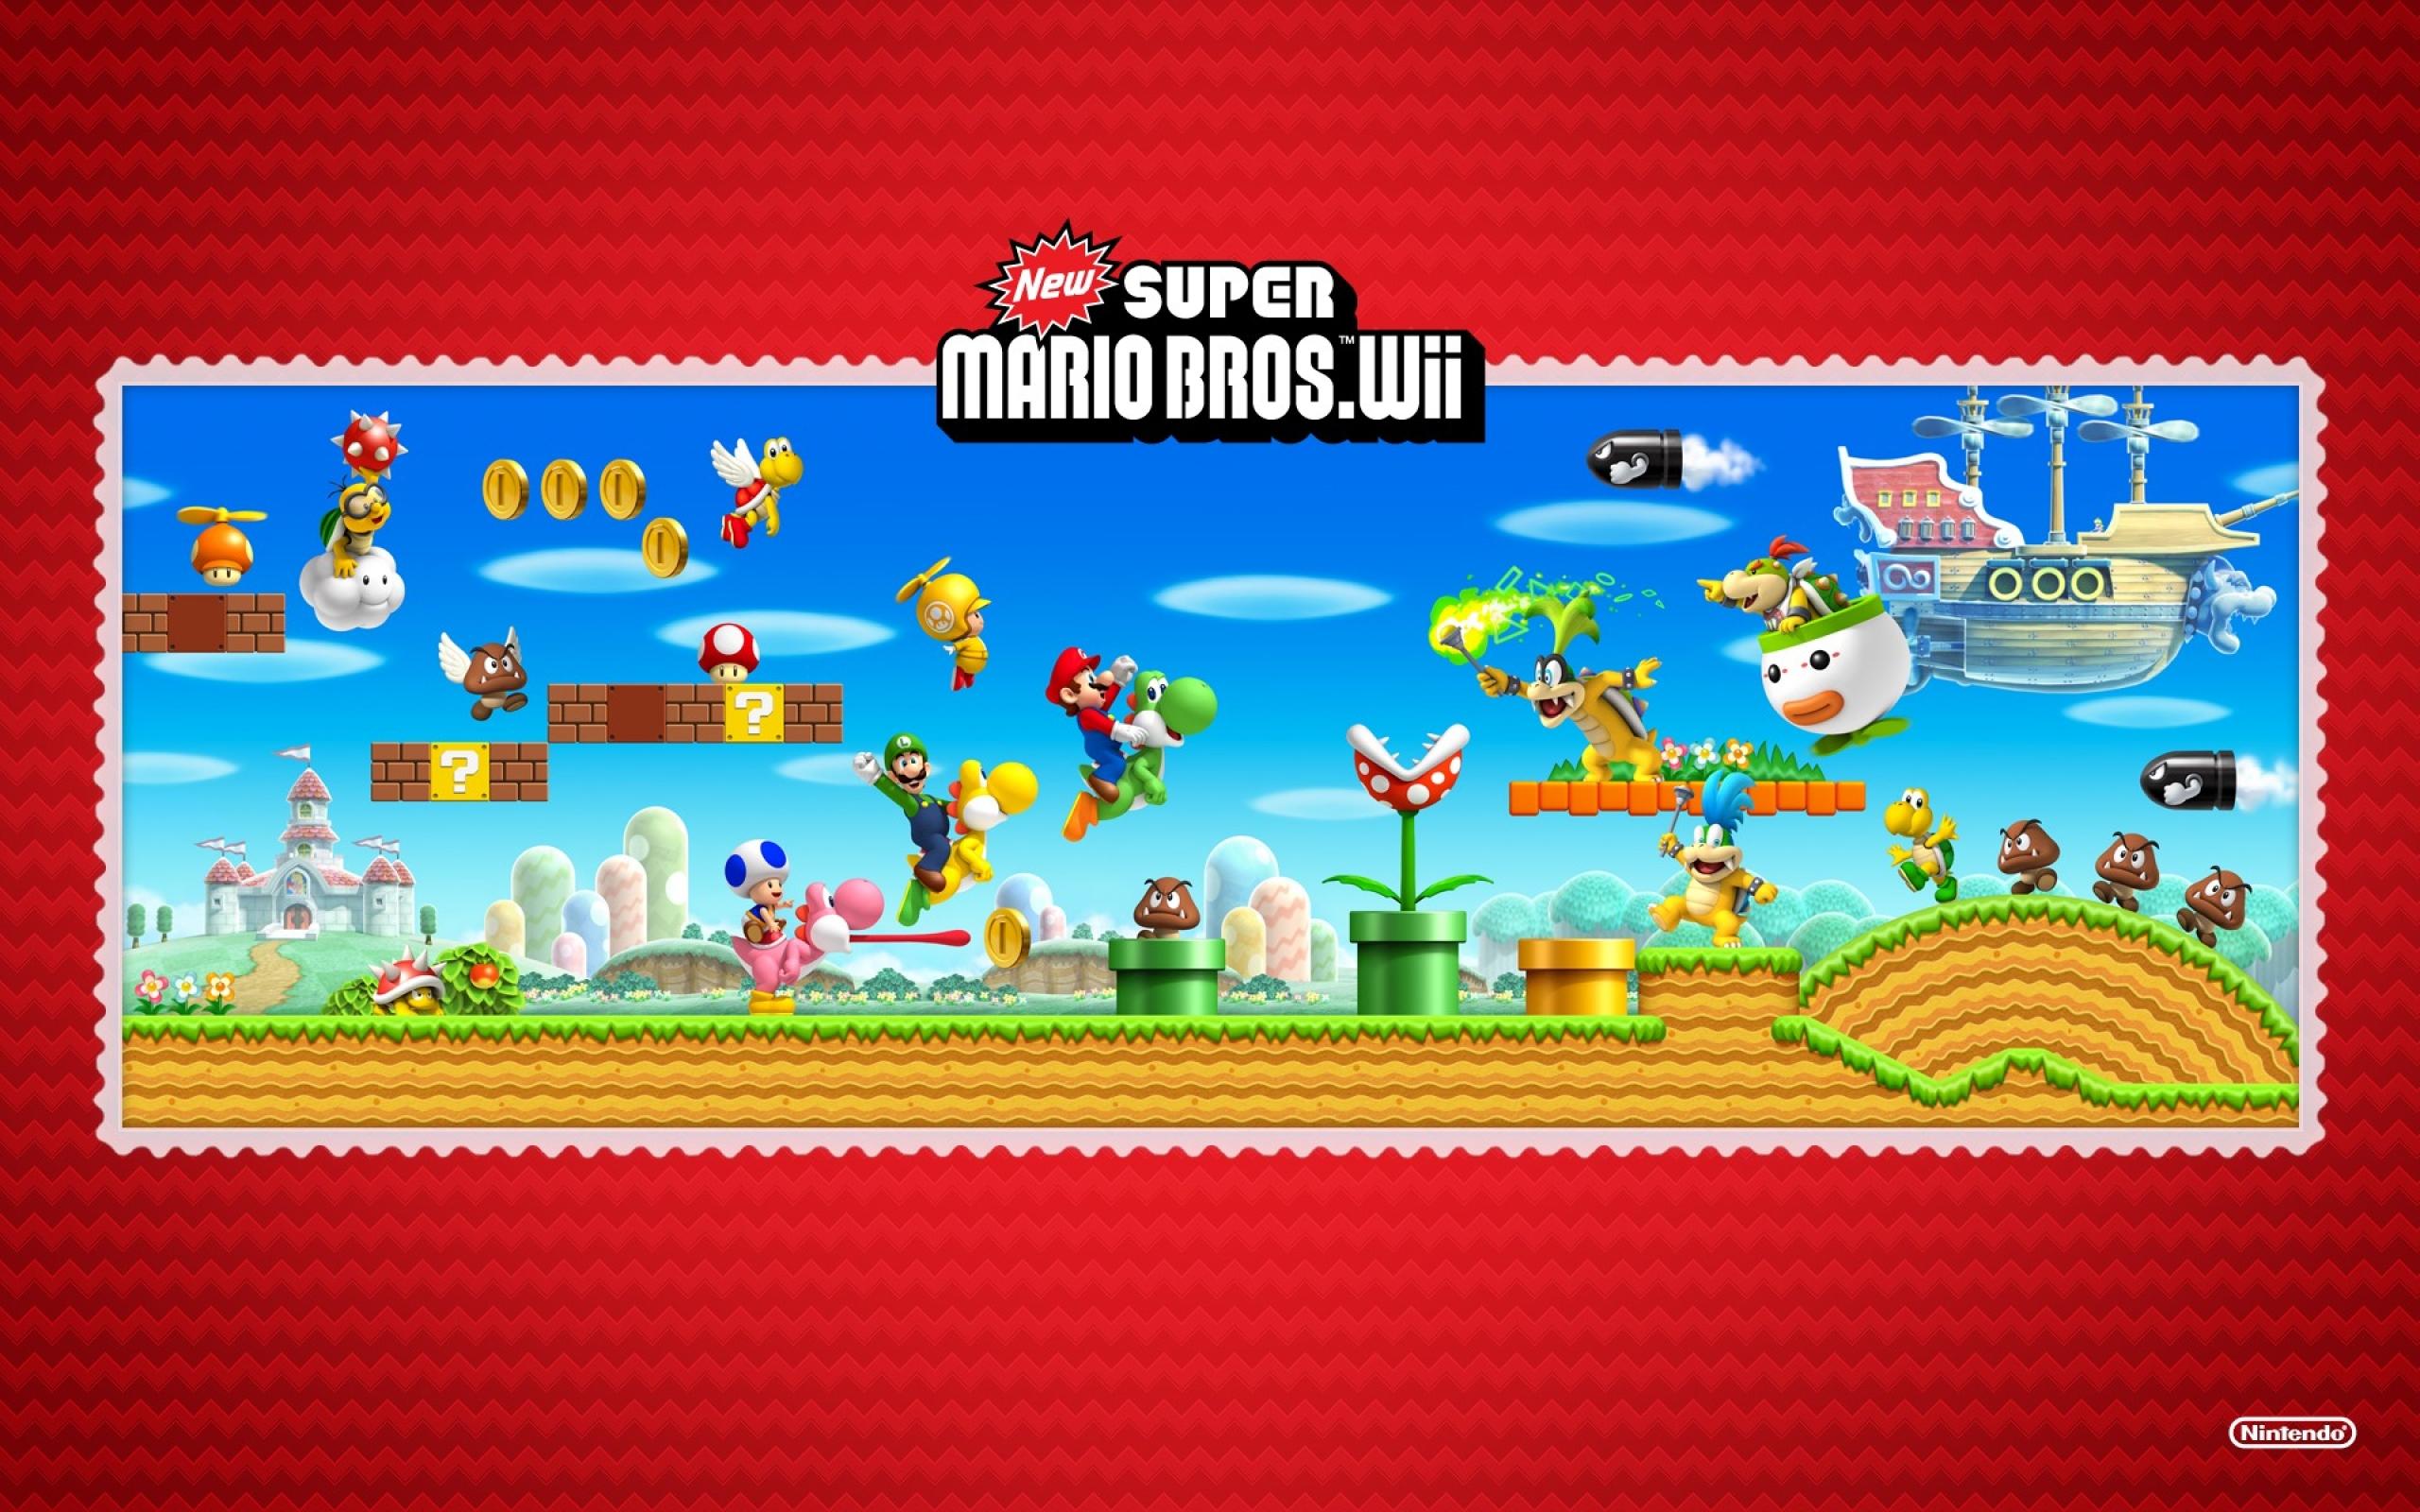 Mario Kleurplaten Mushroom.49 Mario Bros Wallpaper On Wallpapersafari